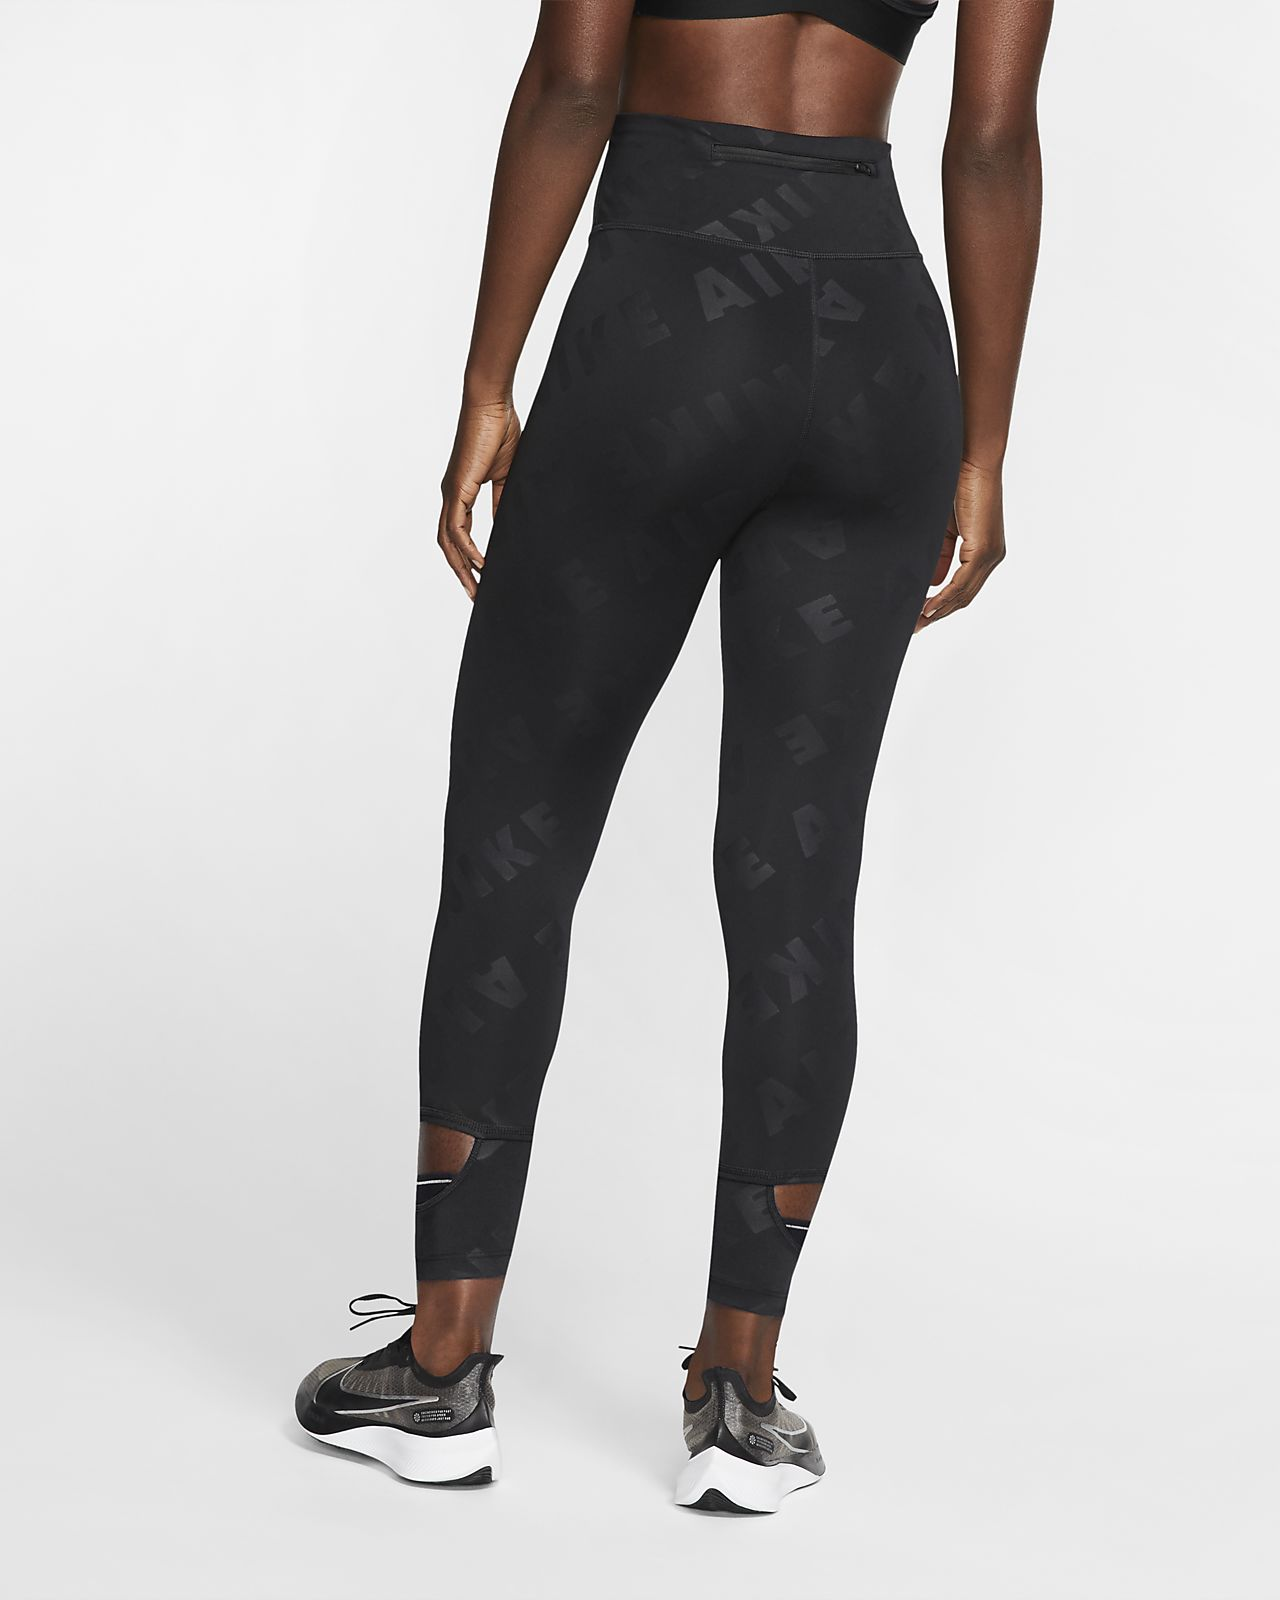 Damskie legginsy 78 do biegania Nike Air